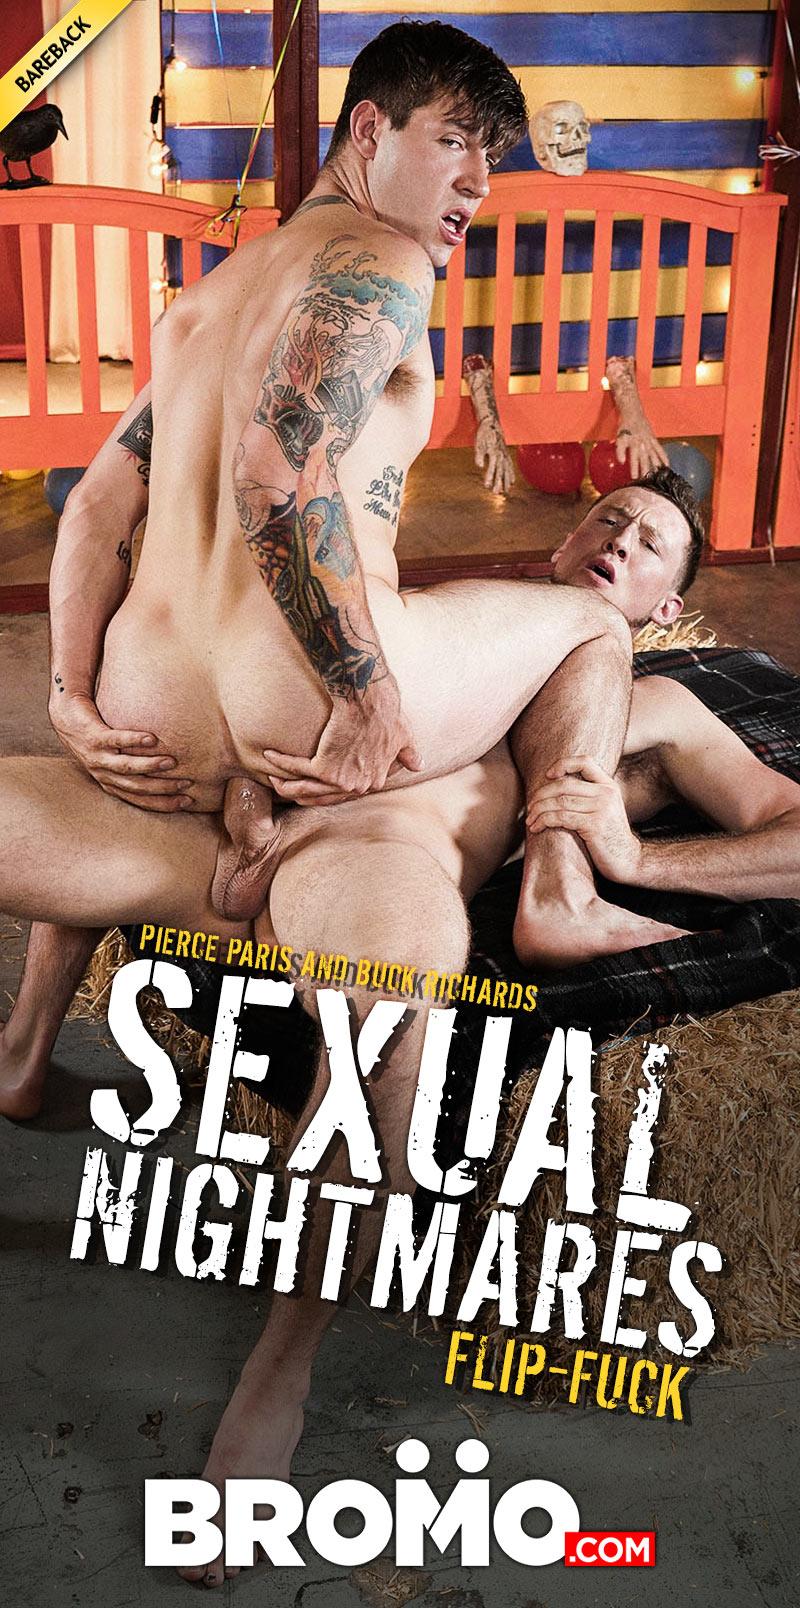 Sexual Nightmares, Part Three (Pierce Paris Fucks Buck Richards) at BROMO!